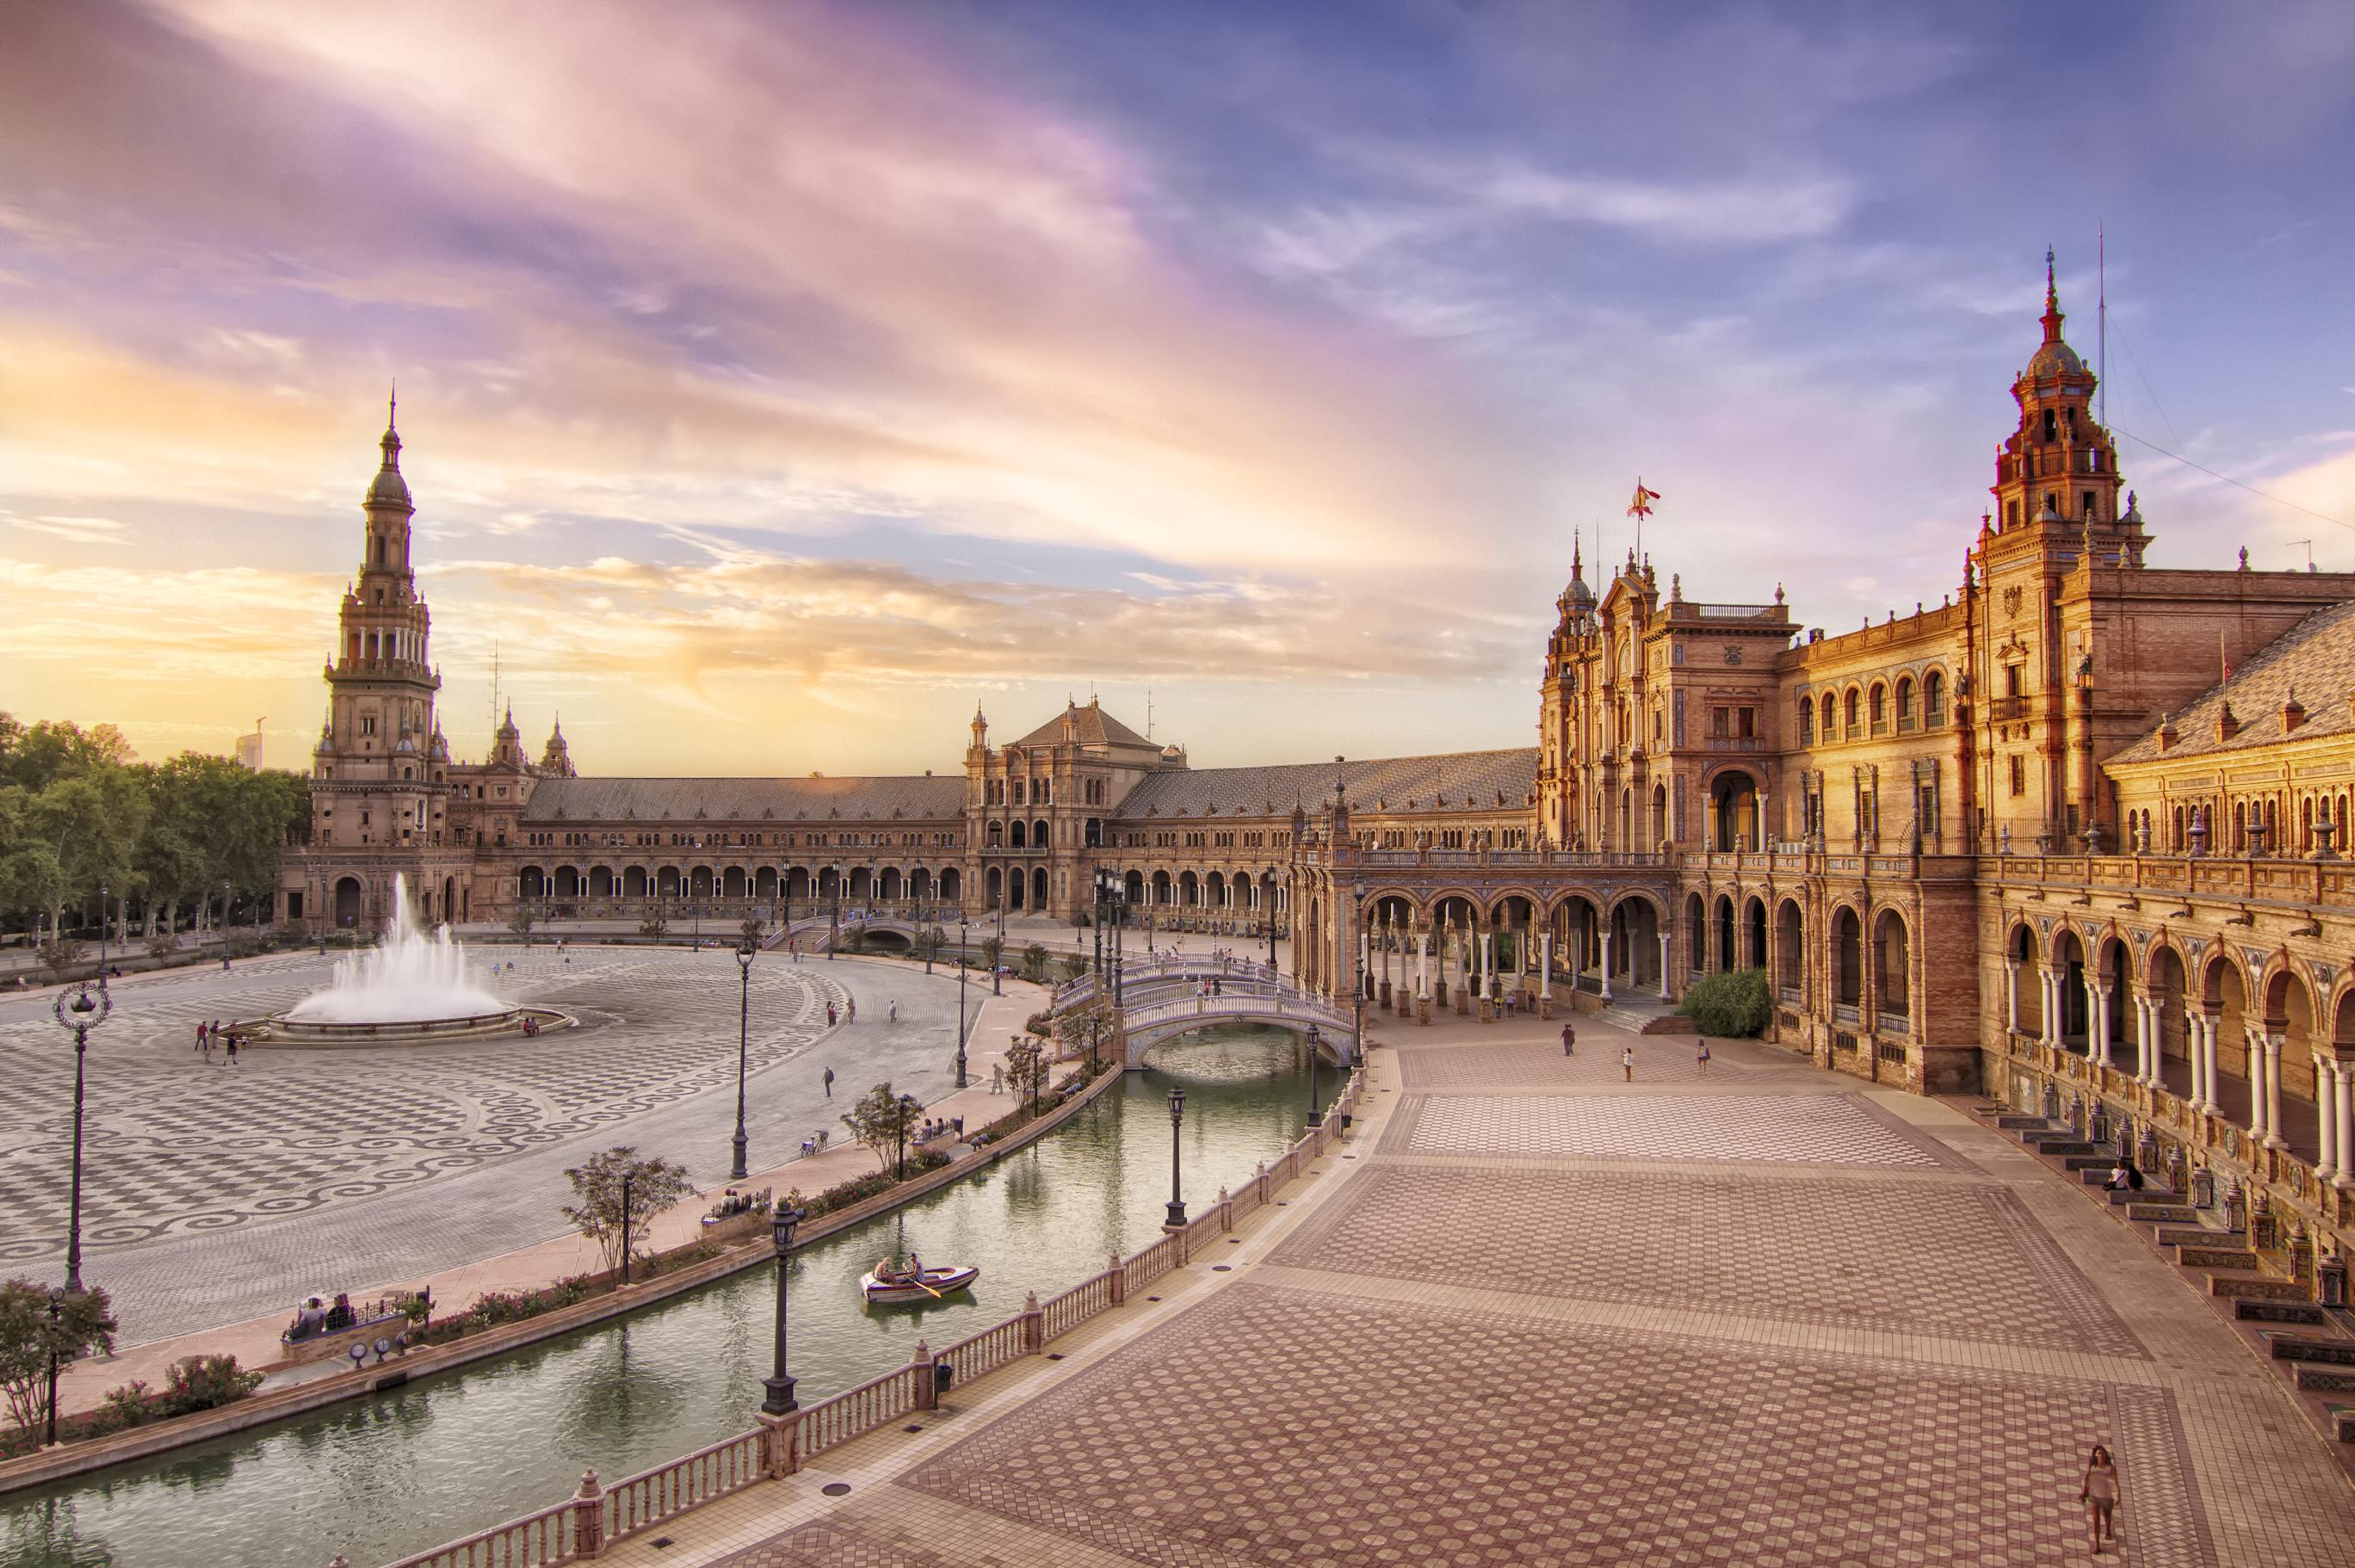 File:Monumental Plaza de España de Sevilla.jpg - Wikimedia Commons